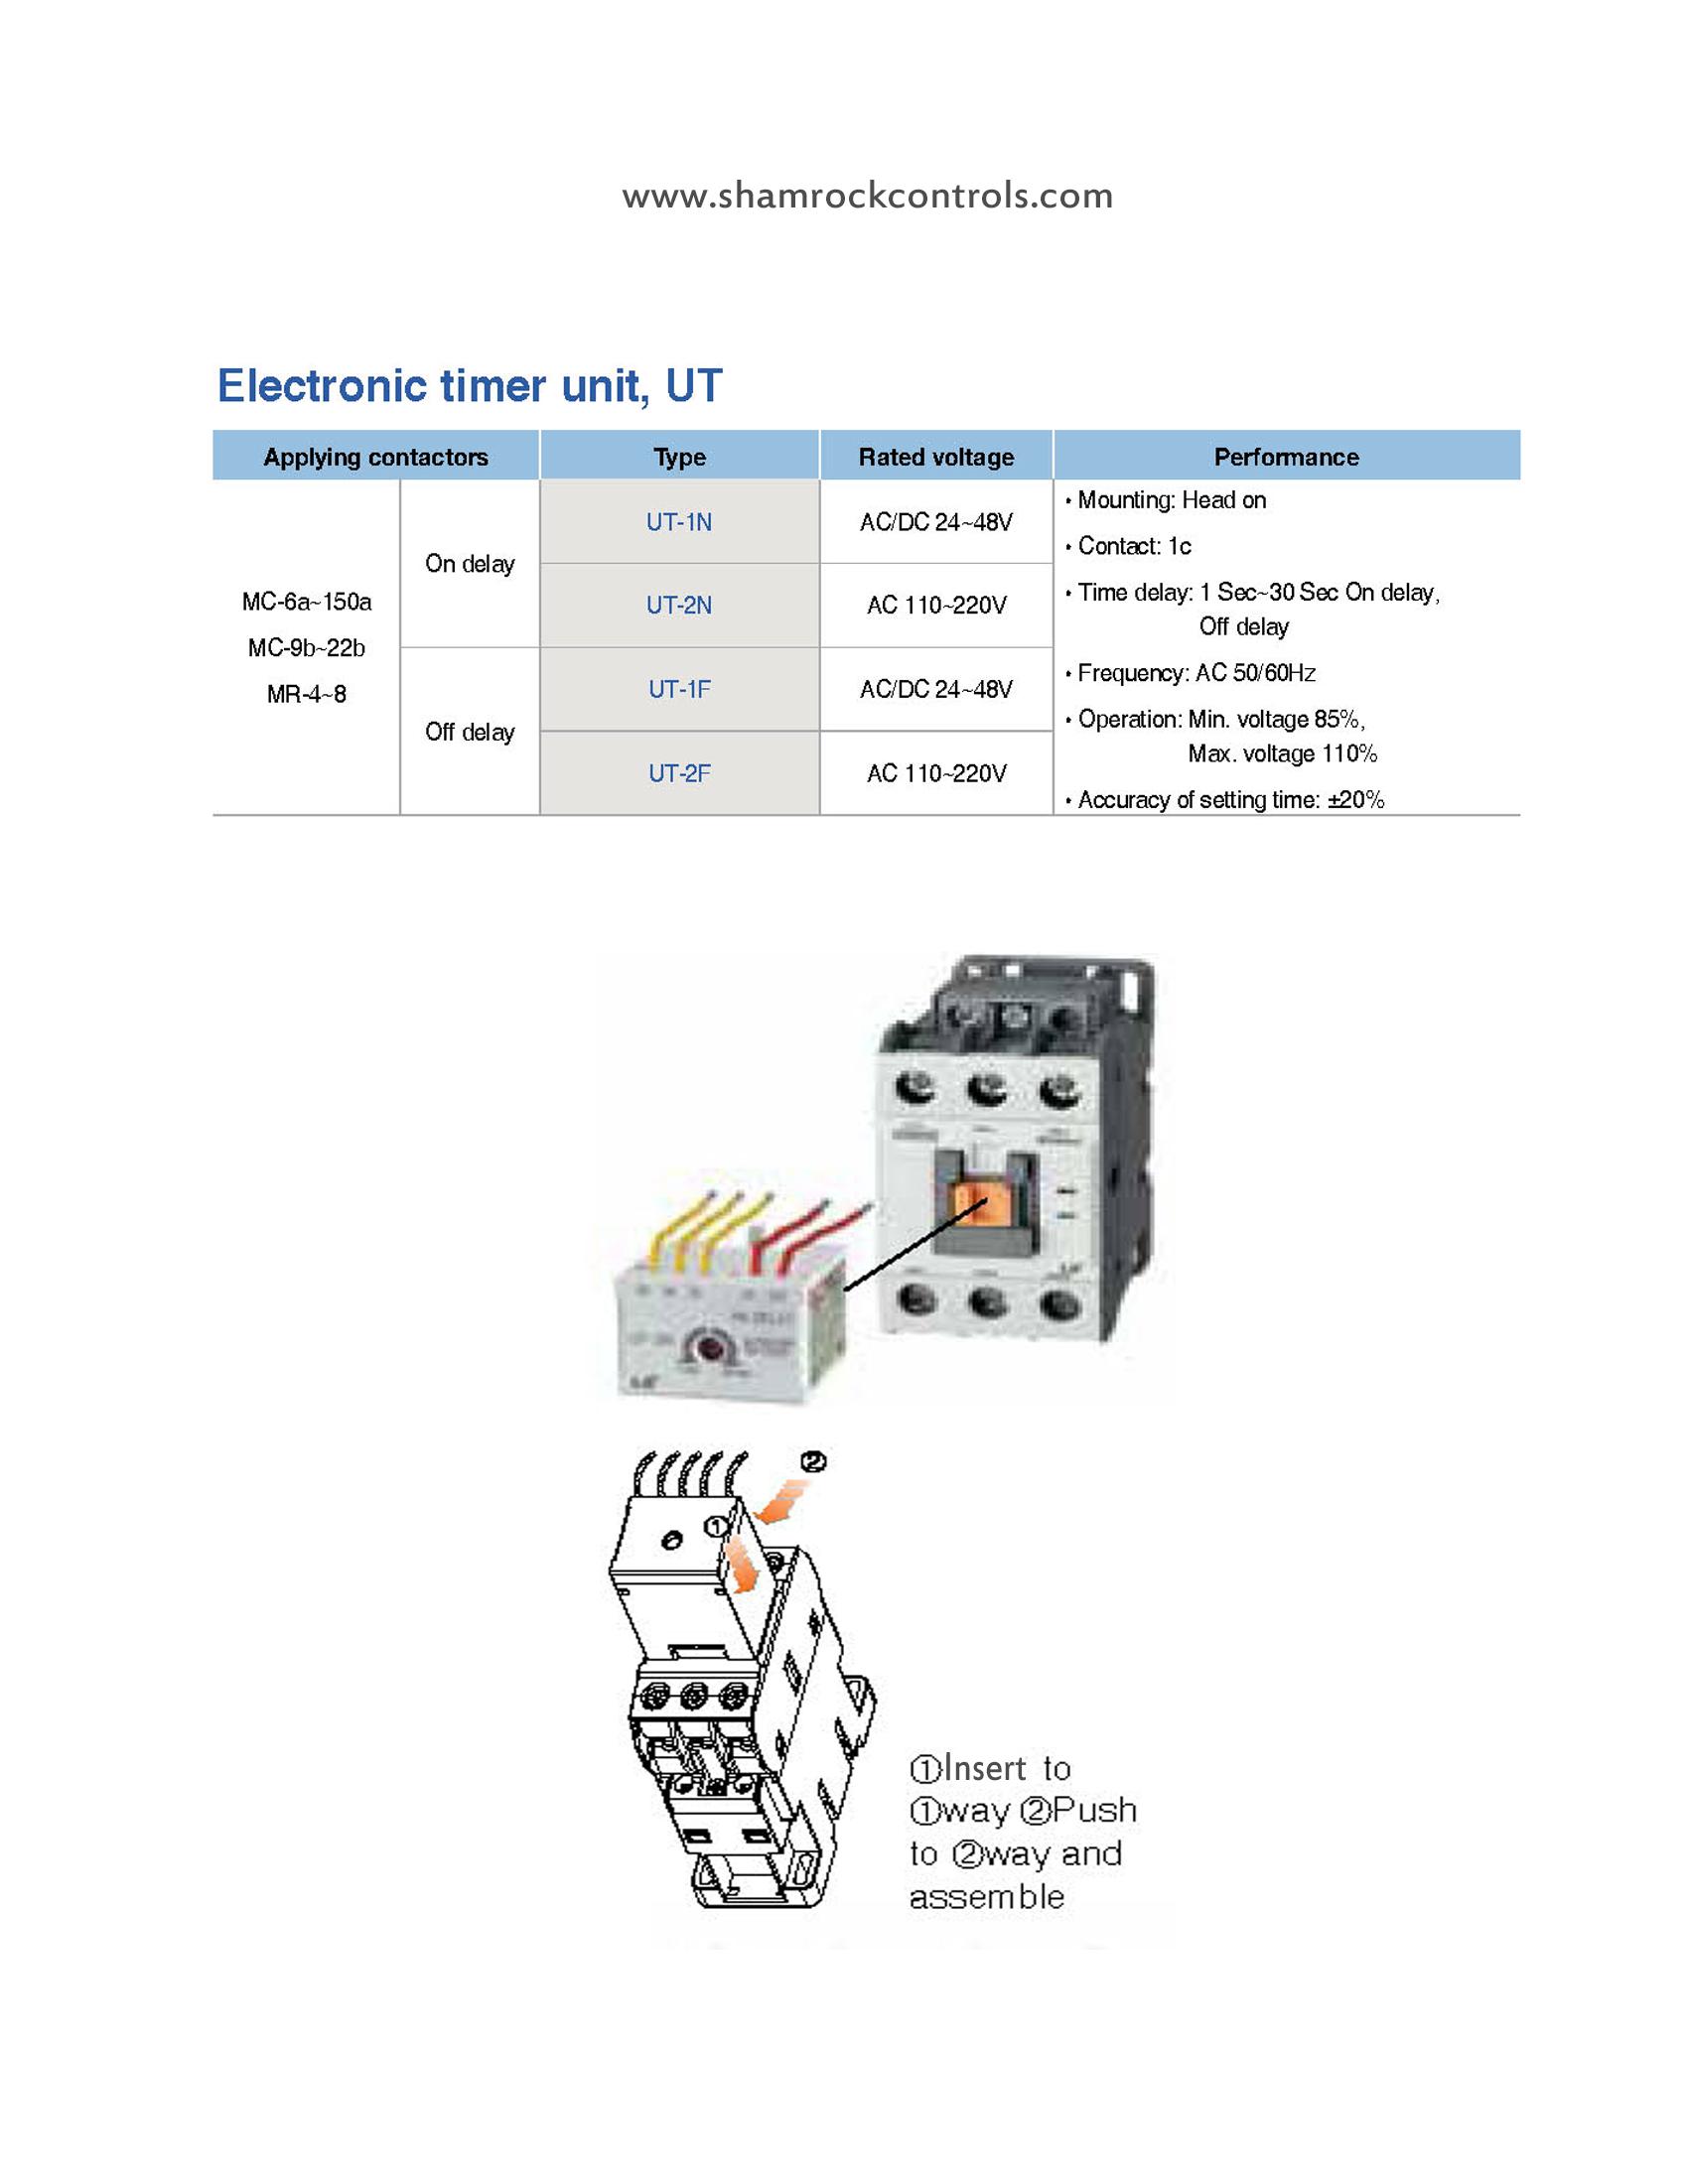 Ut 2f Metasol Contactor Electronic Timer Unit